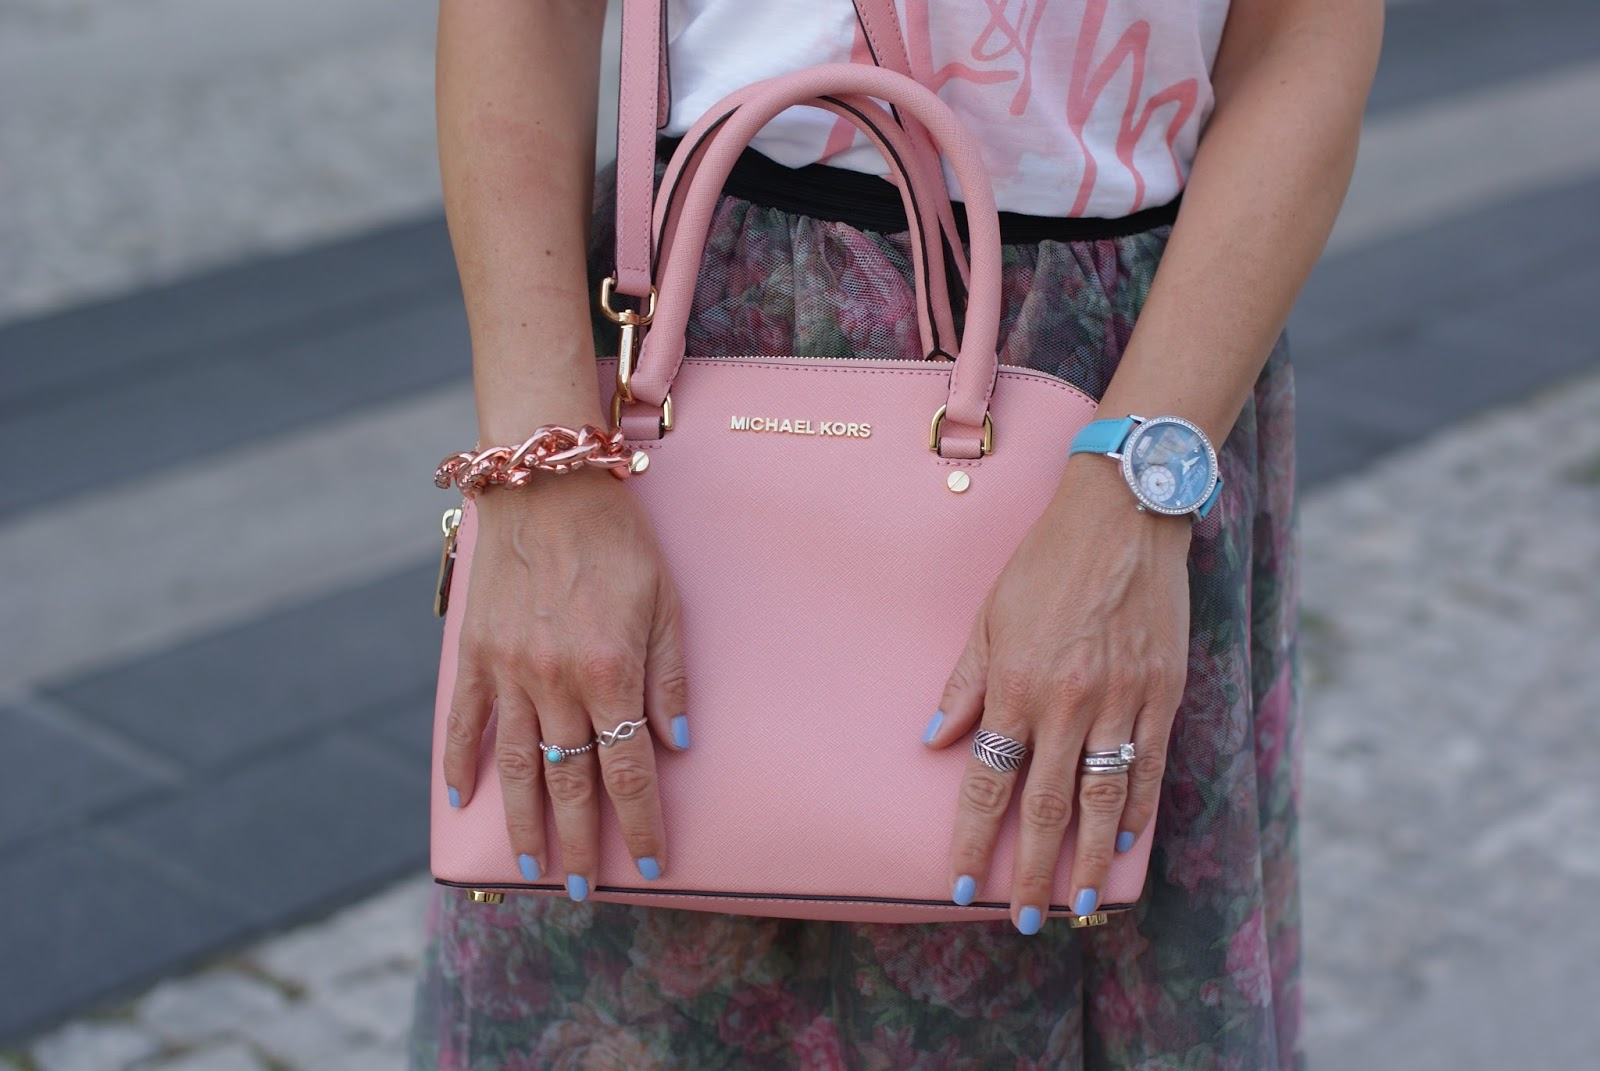 Michael Kors cindy pink bag and Luca Barra capri watch on Fashion and Cookies fashion blog